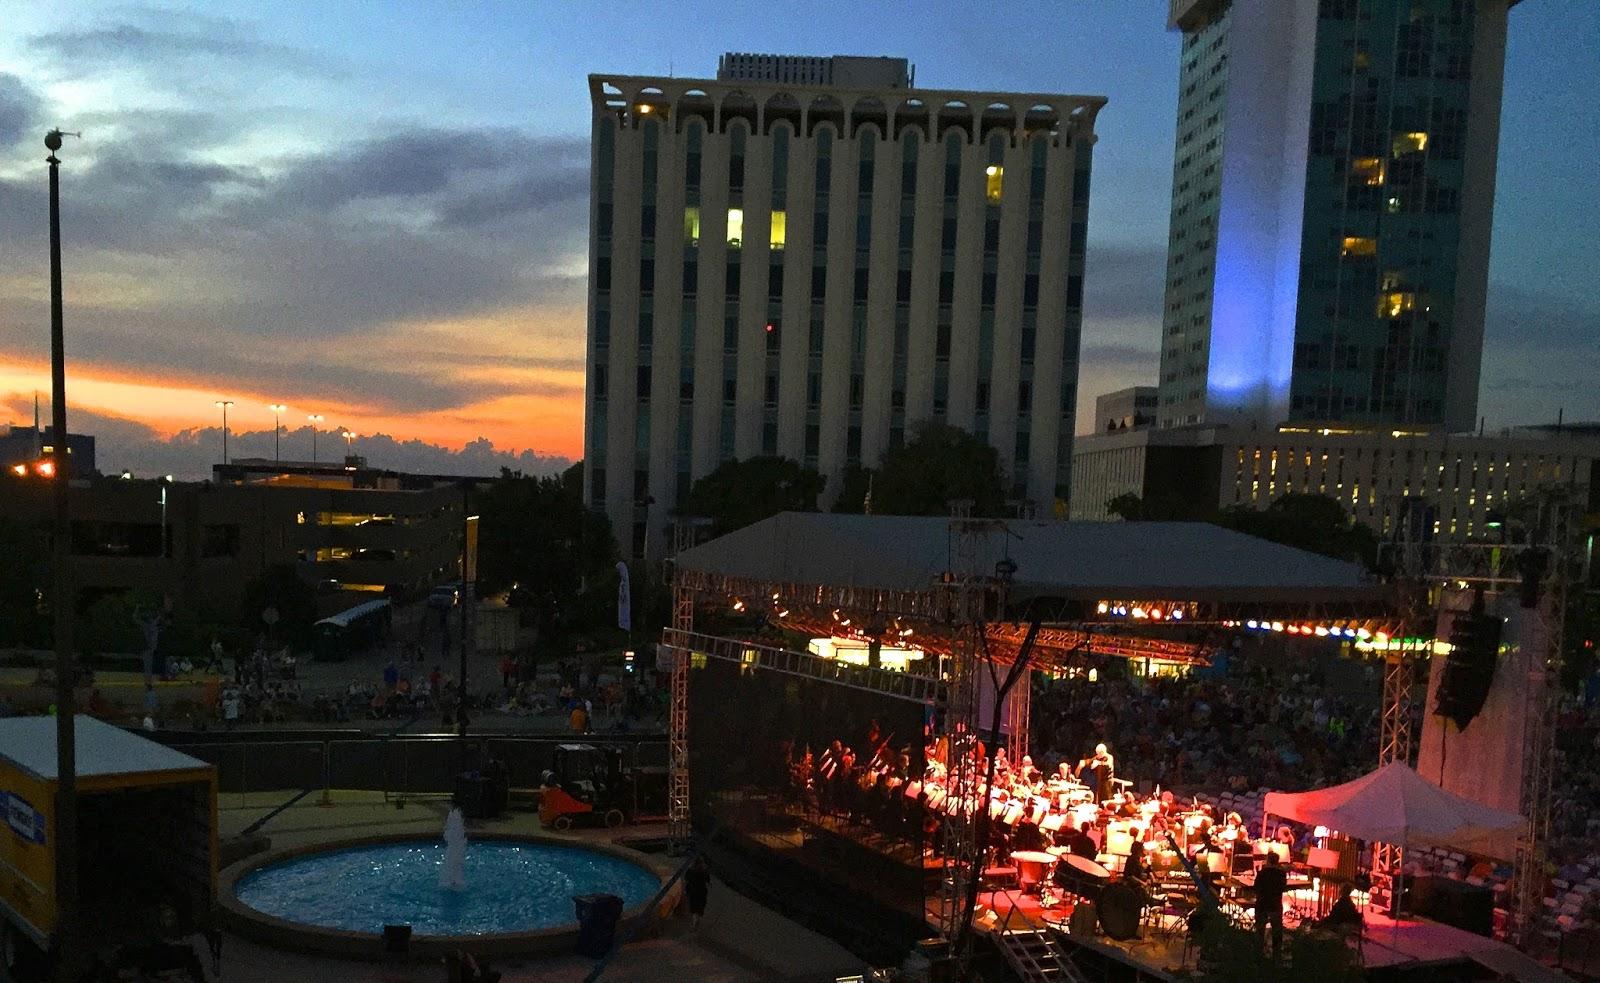 Wichita Symphony Twilight Pops Concert at the Wichita River Festival